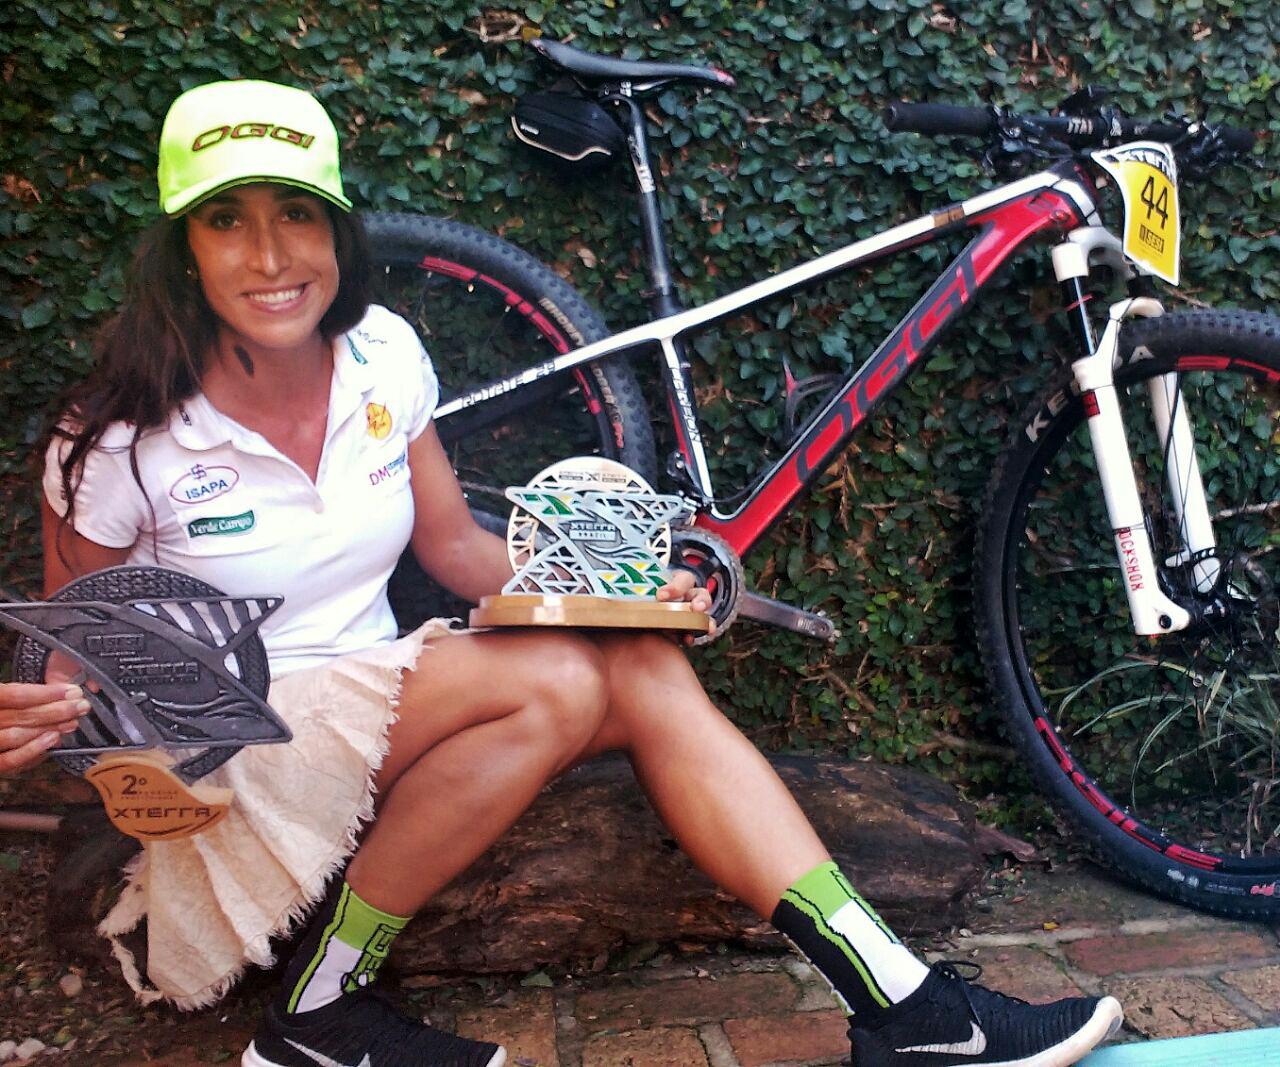 Laura Mira exibe troféus (Divulgação)